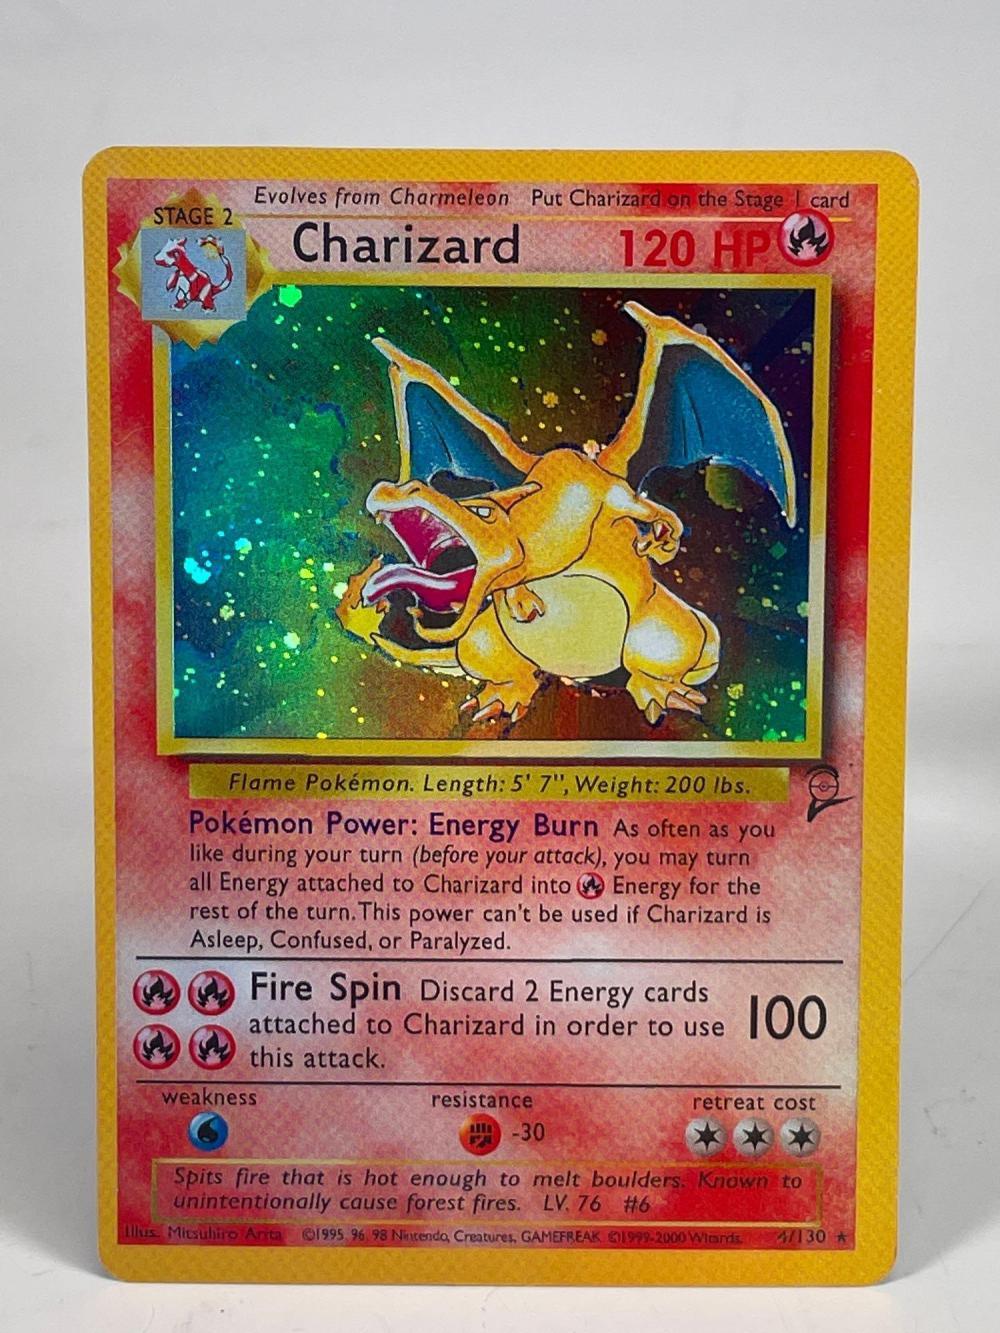 1999-2000 Pokemon Charizard Holo Foil #4/130 WOTC